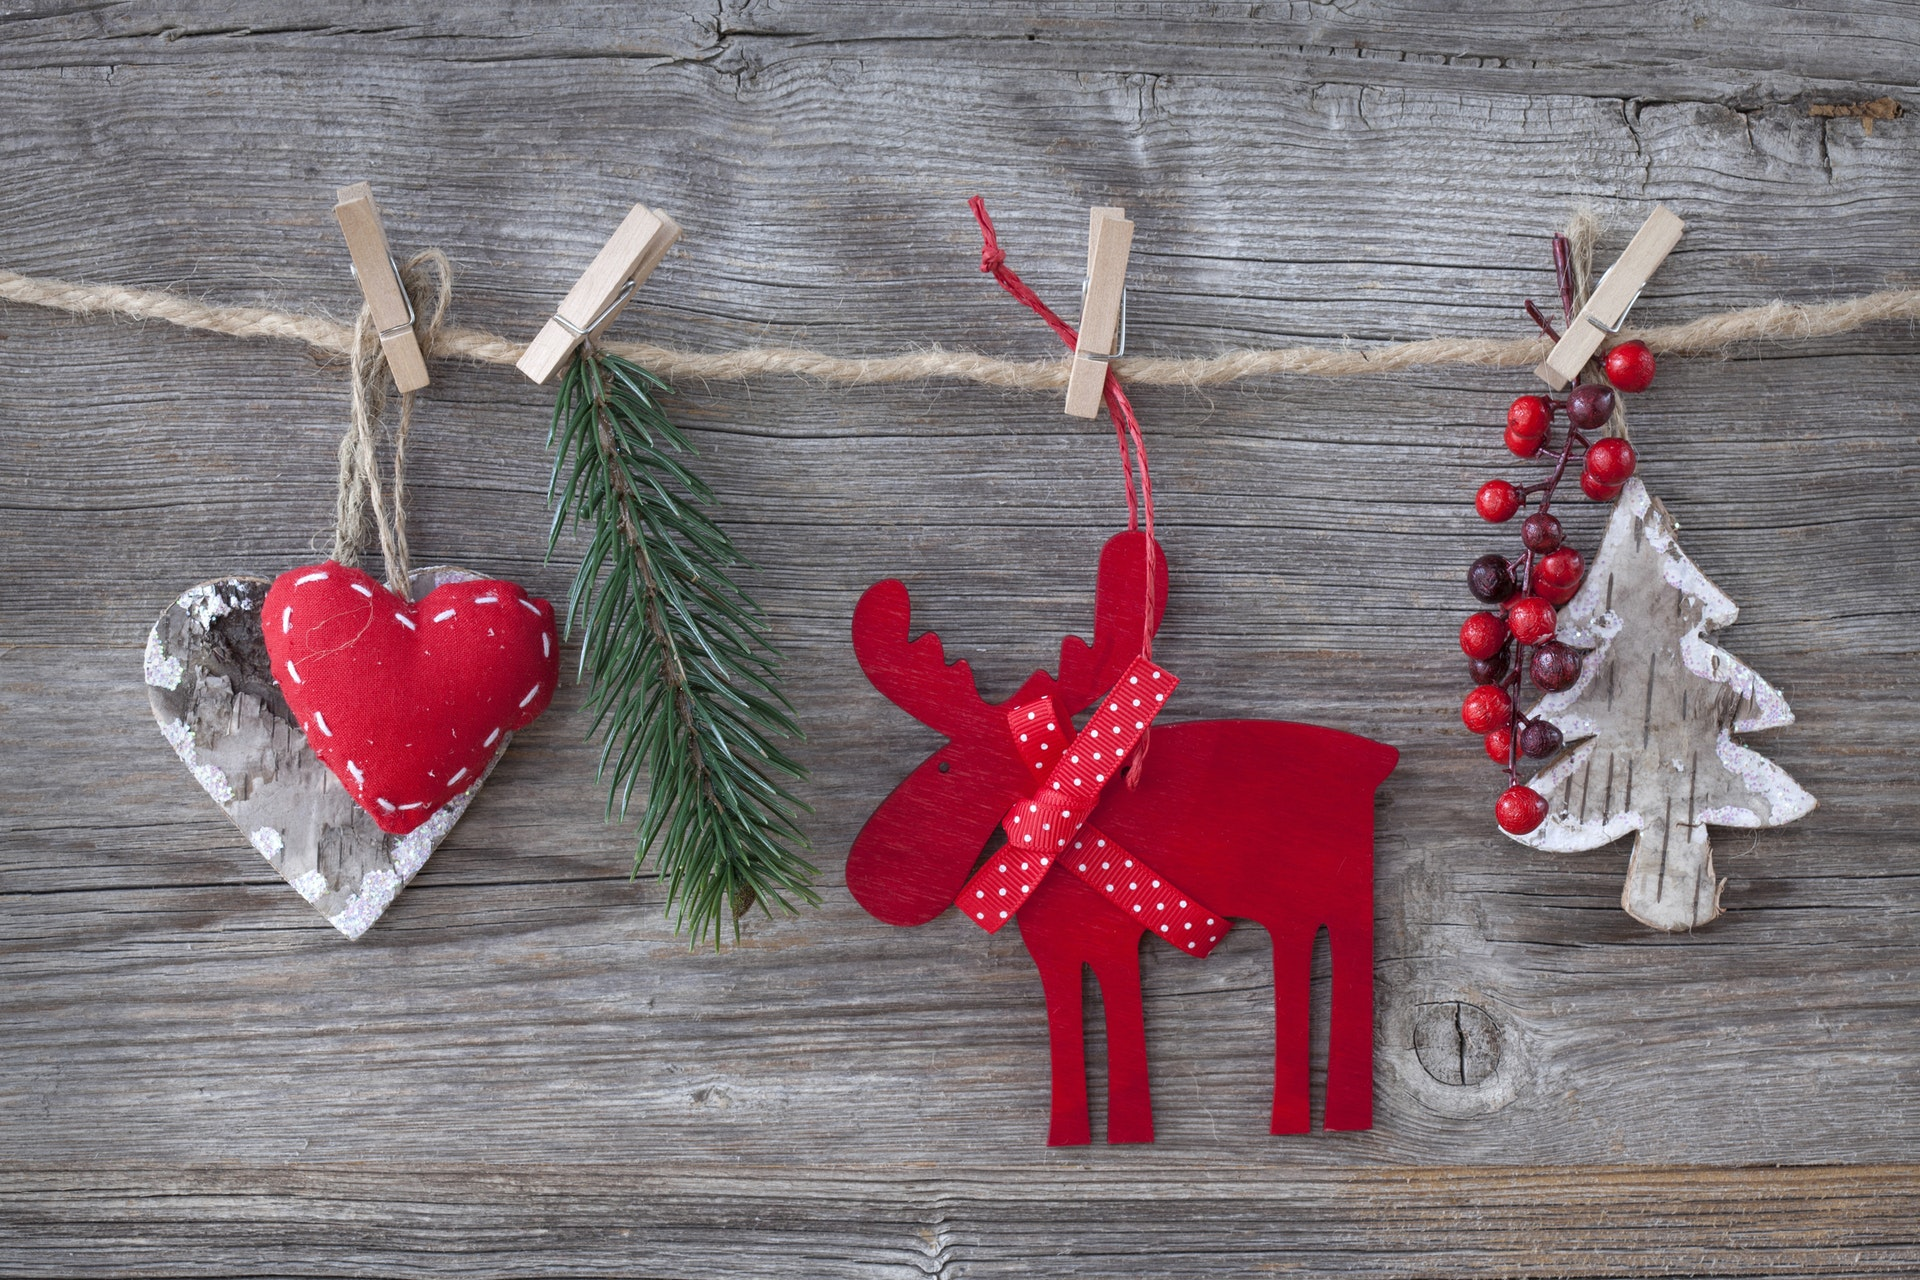 Thumbify wishes you happy holidays